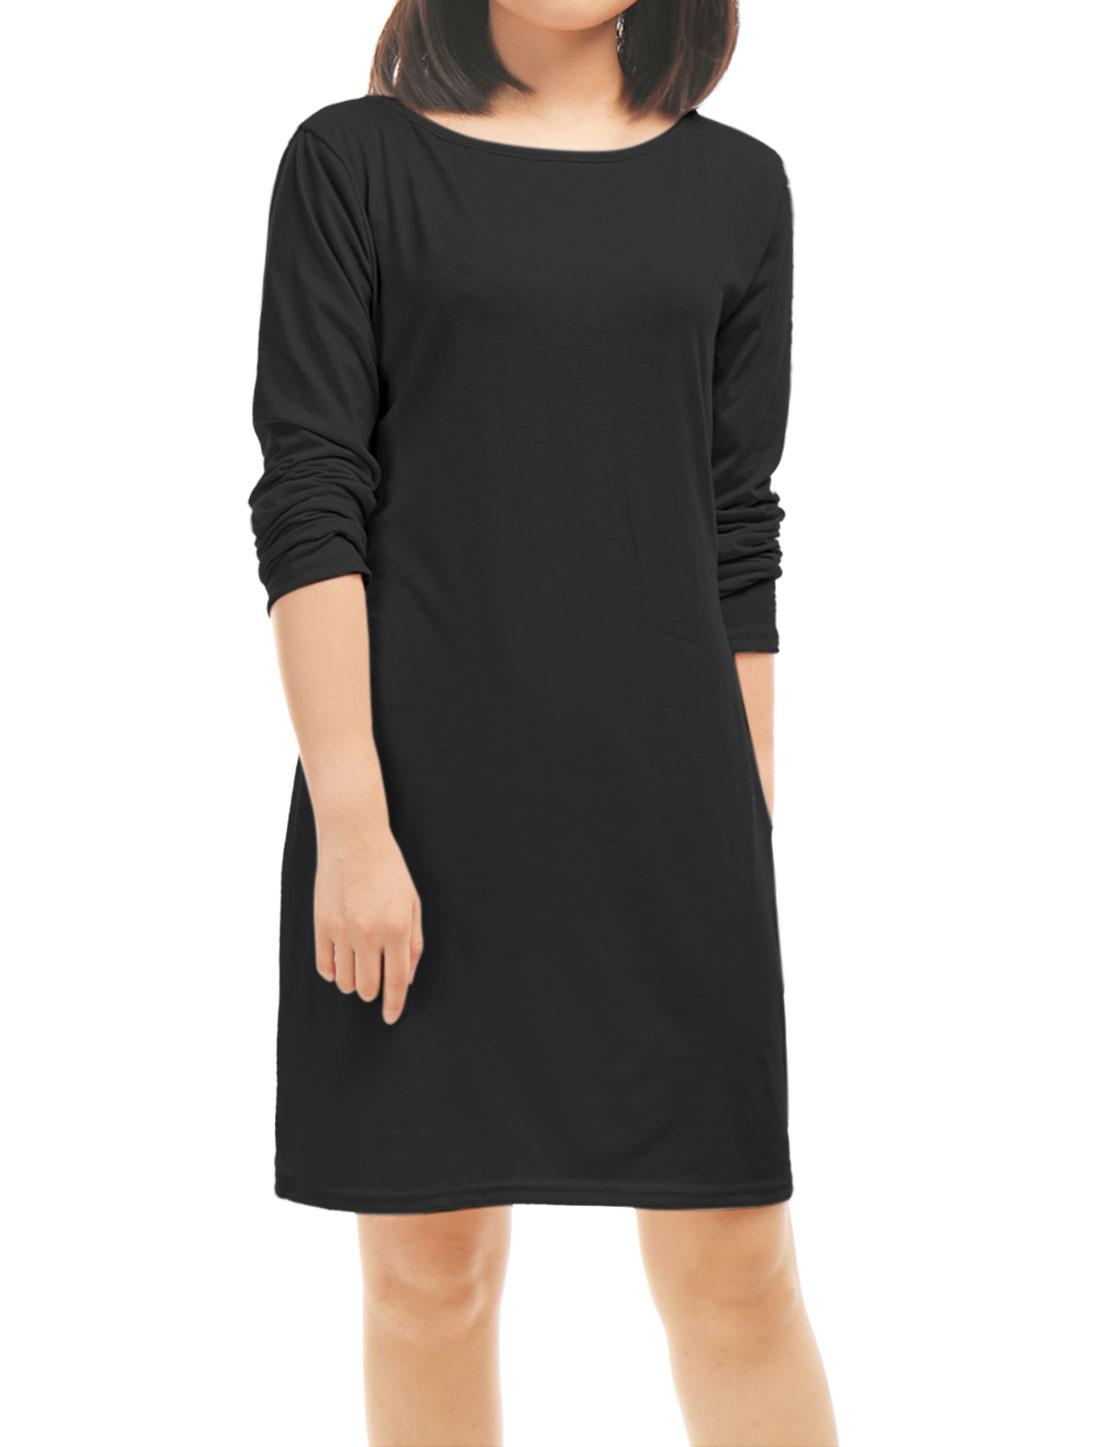 Women-Crew-Neck-Strappy-Back-Cut-Out-Tunic-Sheath-Dress